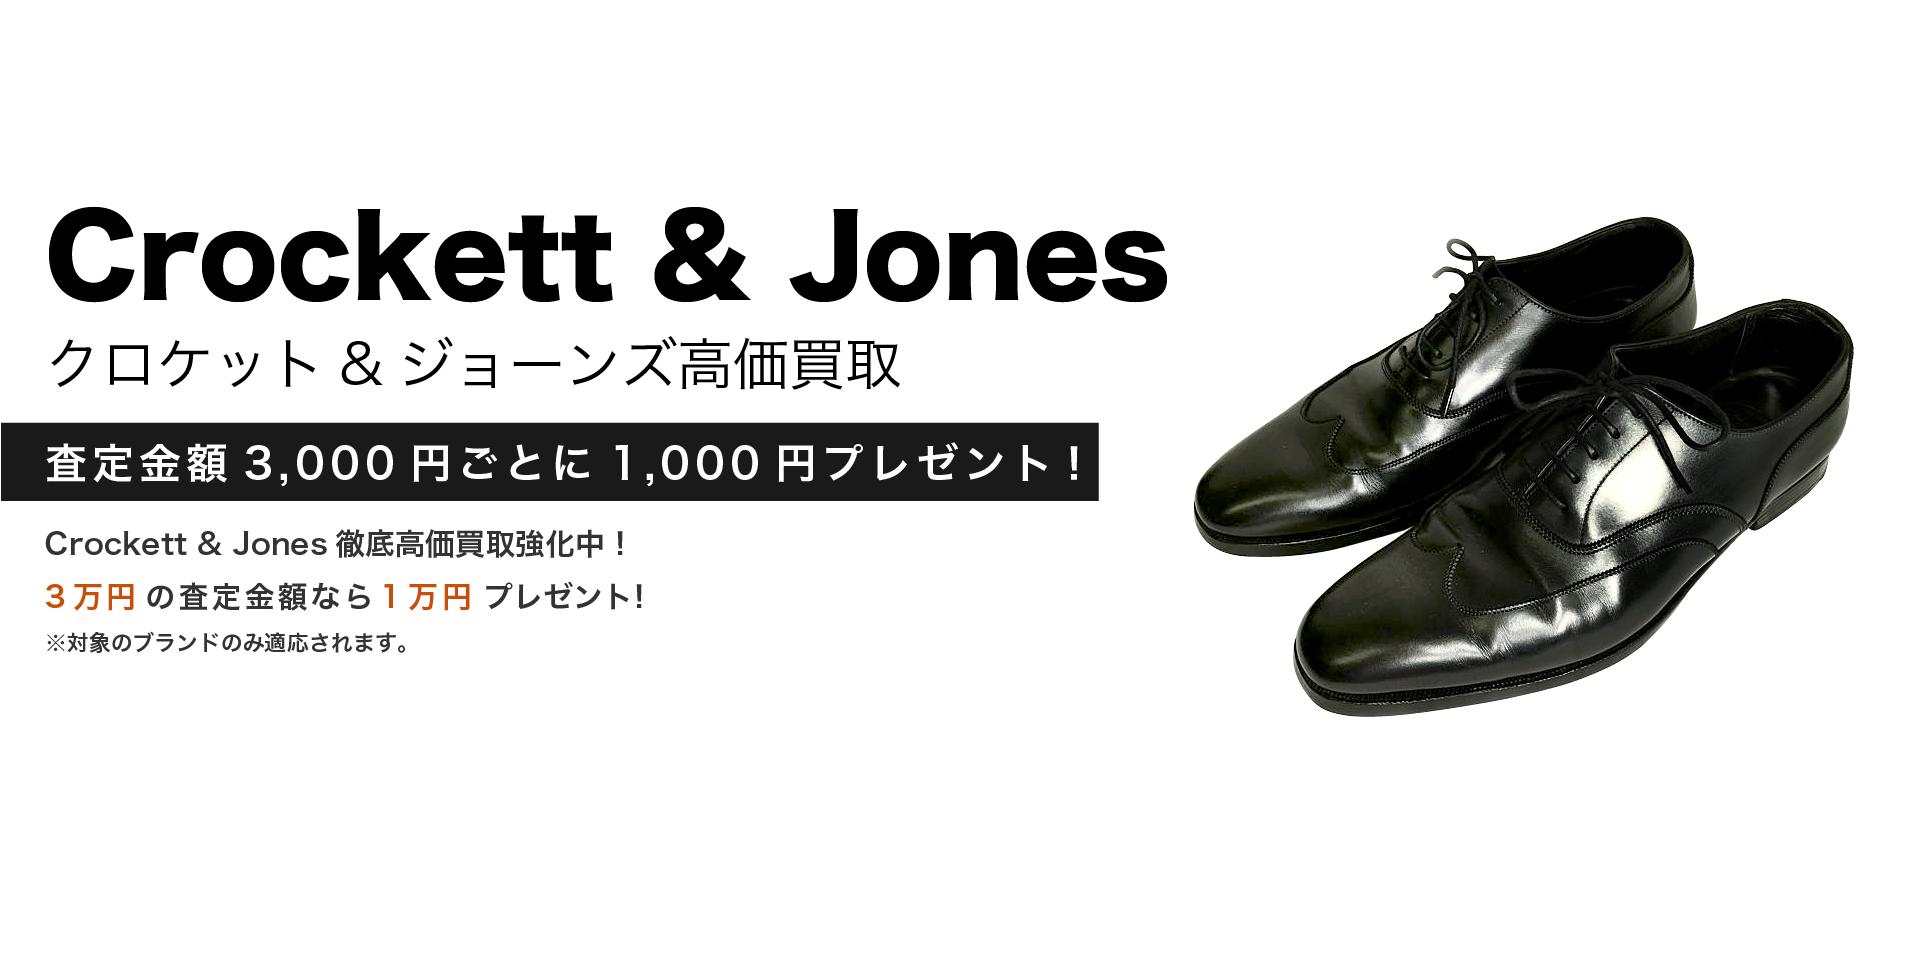 Crockett & Jonesのキービジュアル